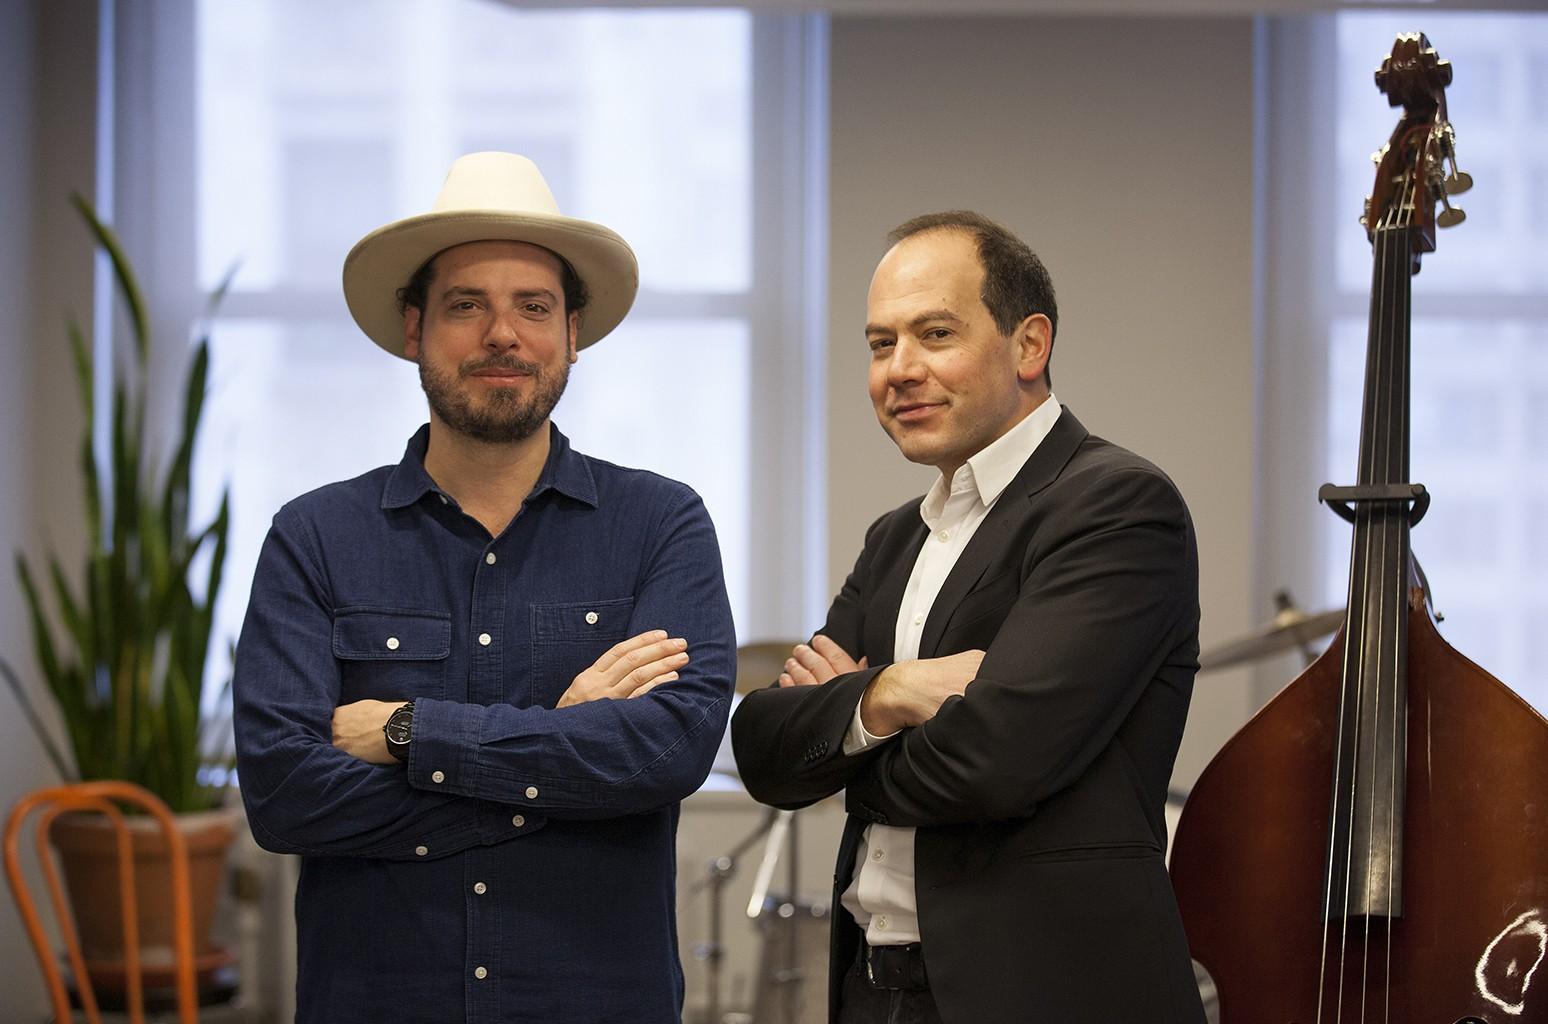 Jared Gutstadt and David Schulhof